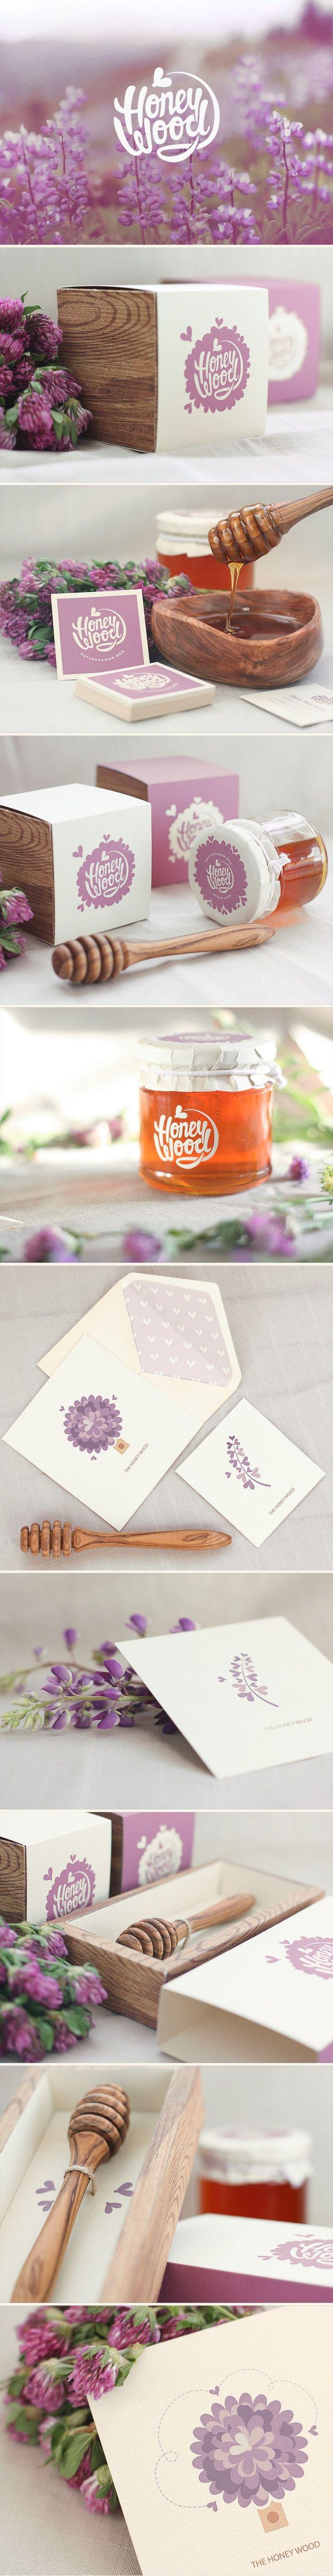 Light Chocolate Cupcake - The Dessert Lover | Honey Product Branding | White & Purple Logo Design and Branding